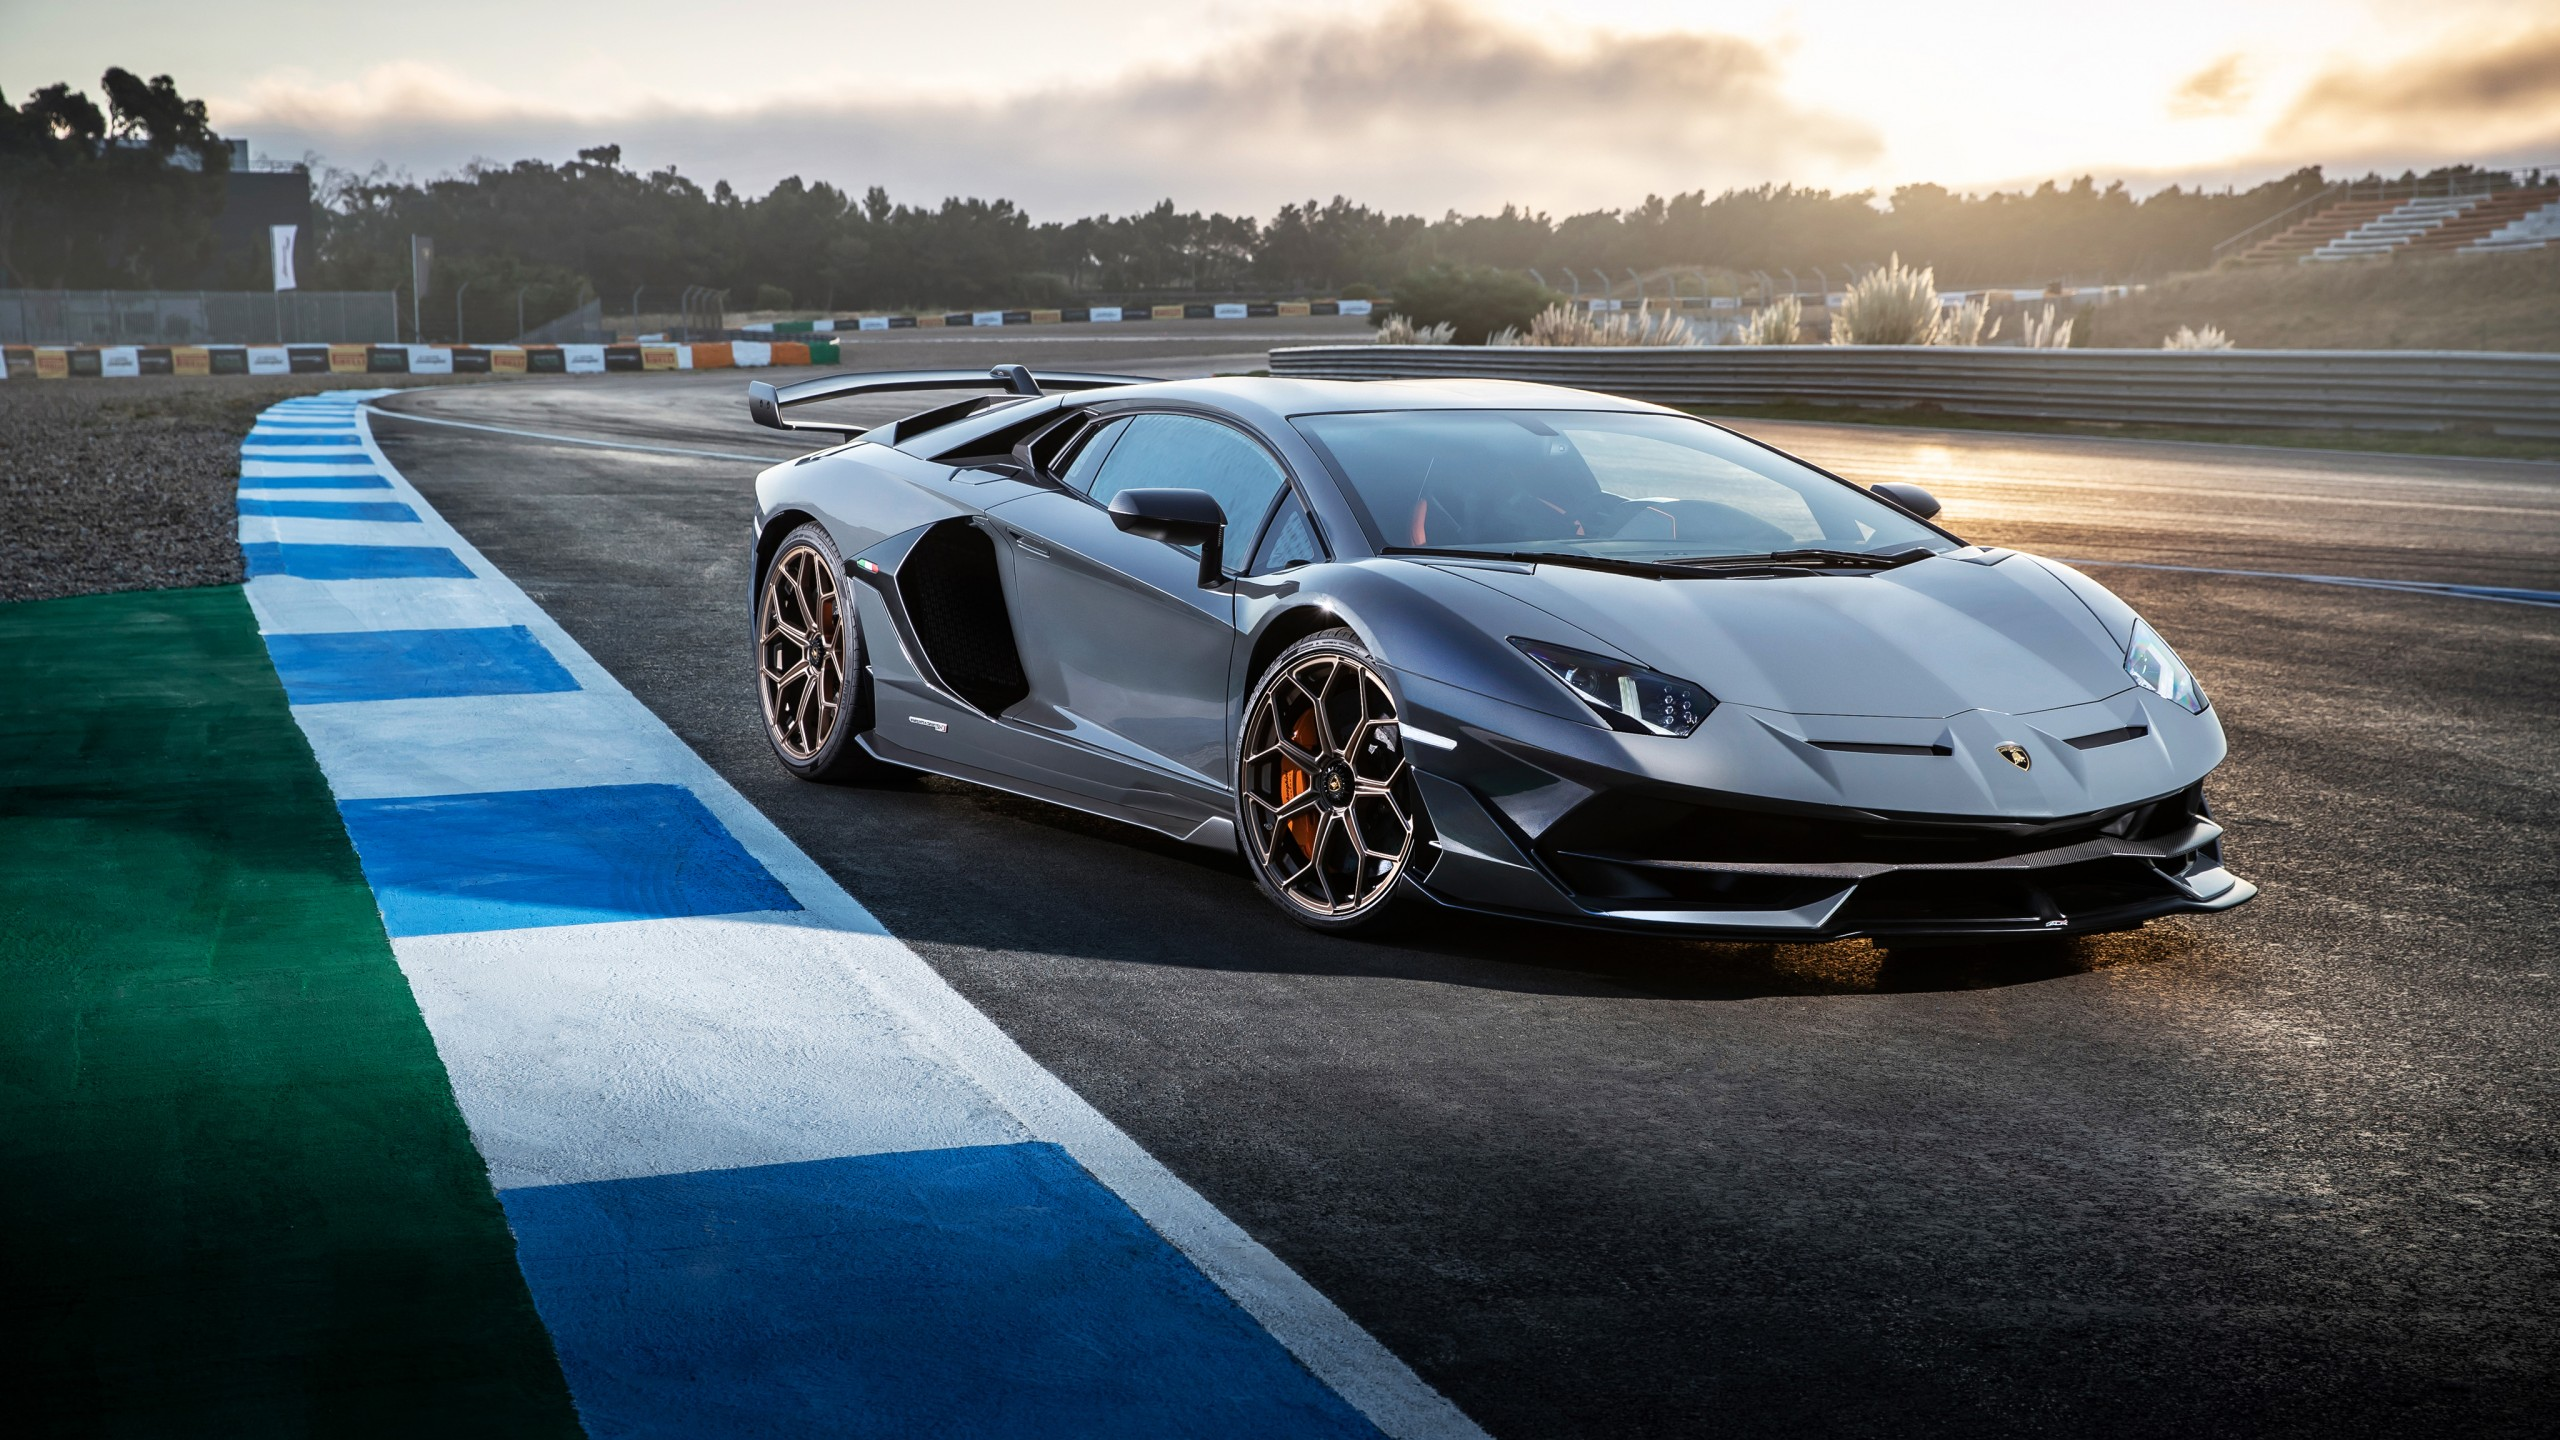 Vehicles Lamborghini Aventador 2560x1440